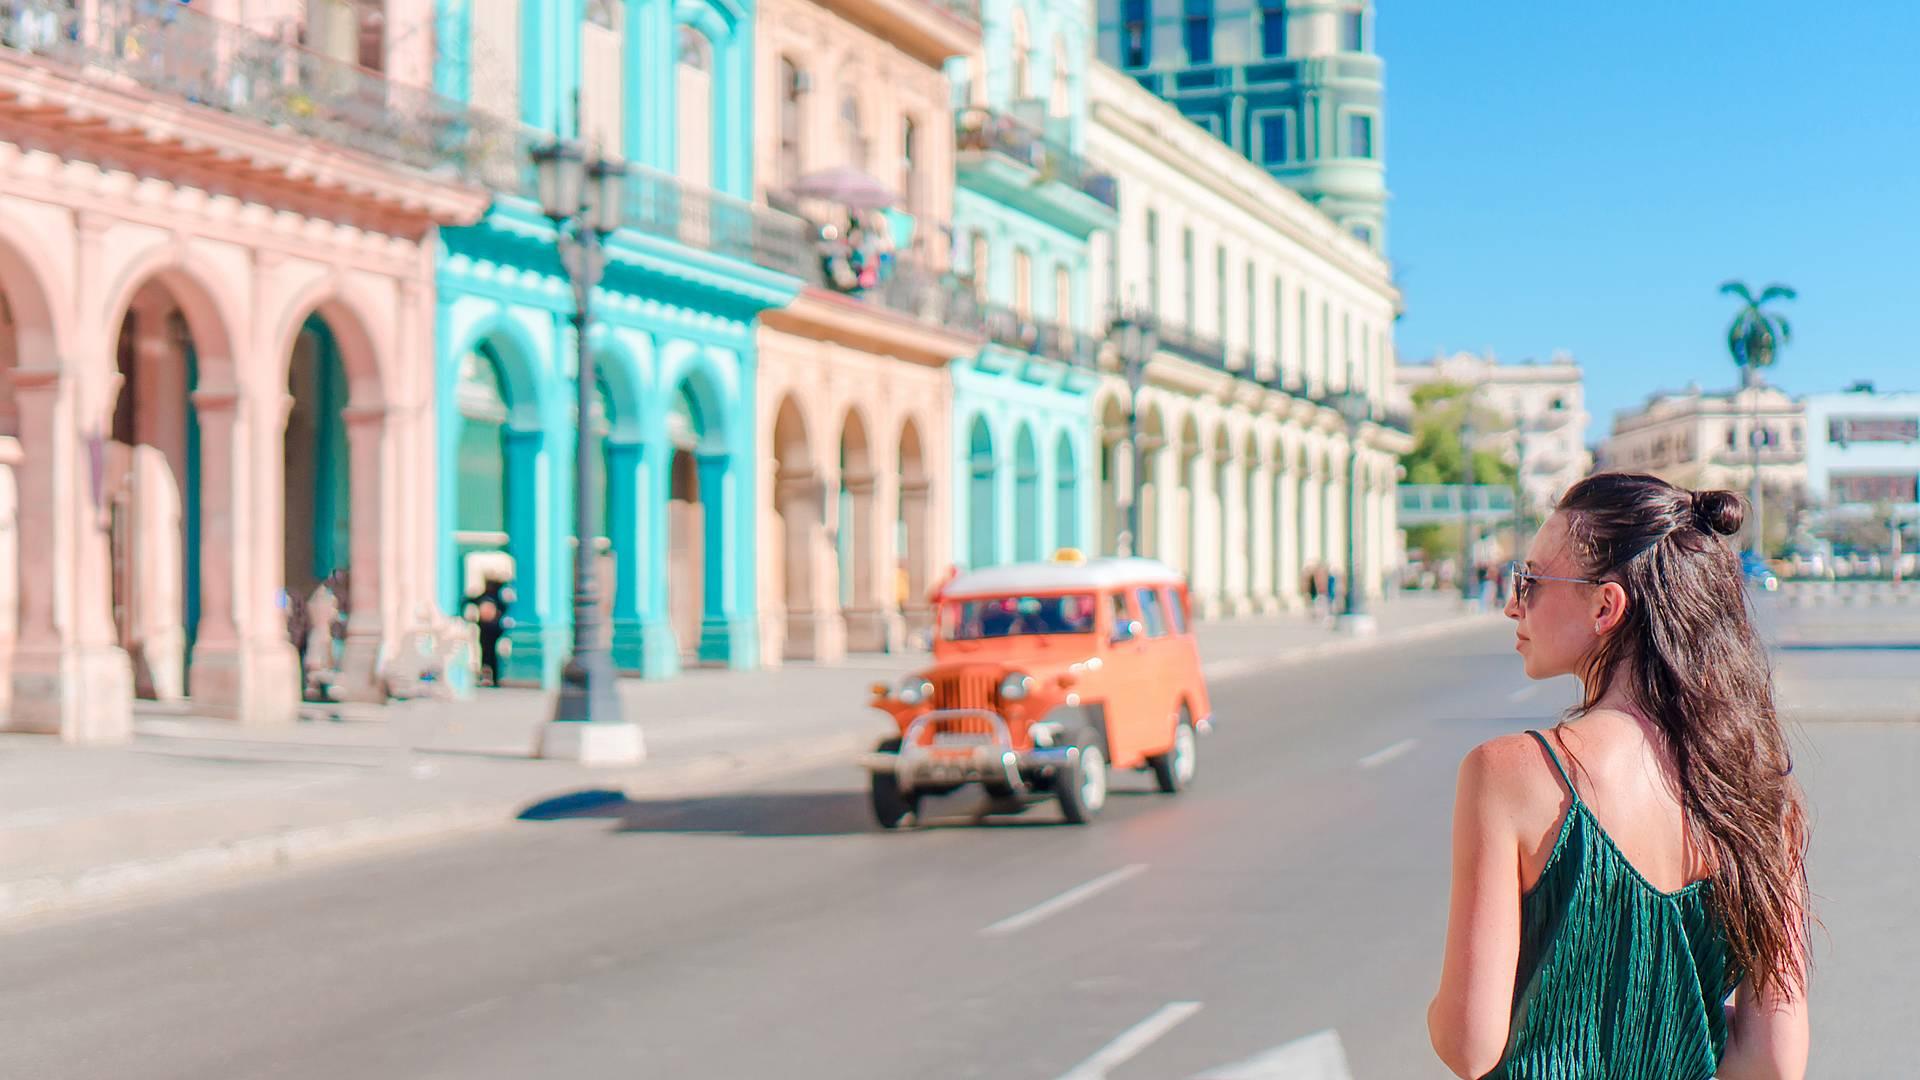 Entdeckungsreise 'Cuba Completo' per Bus